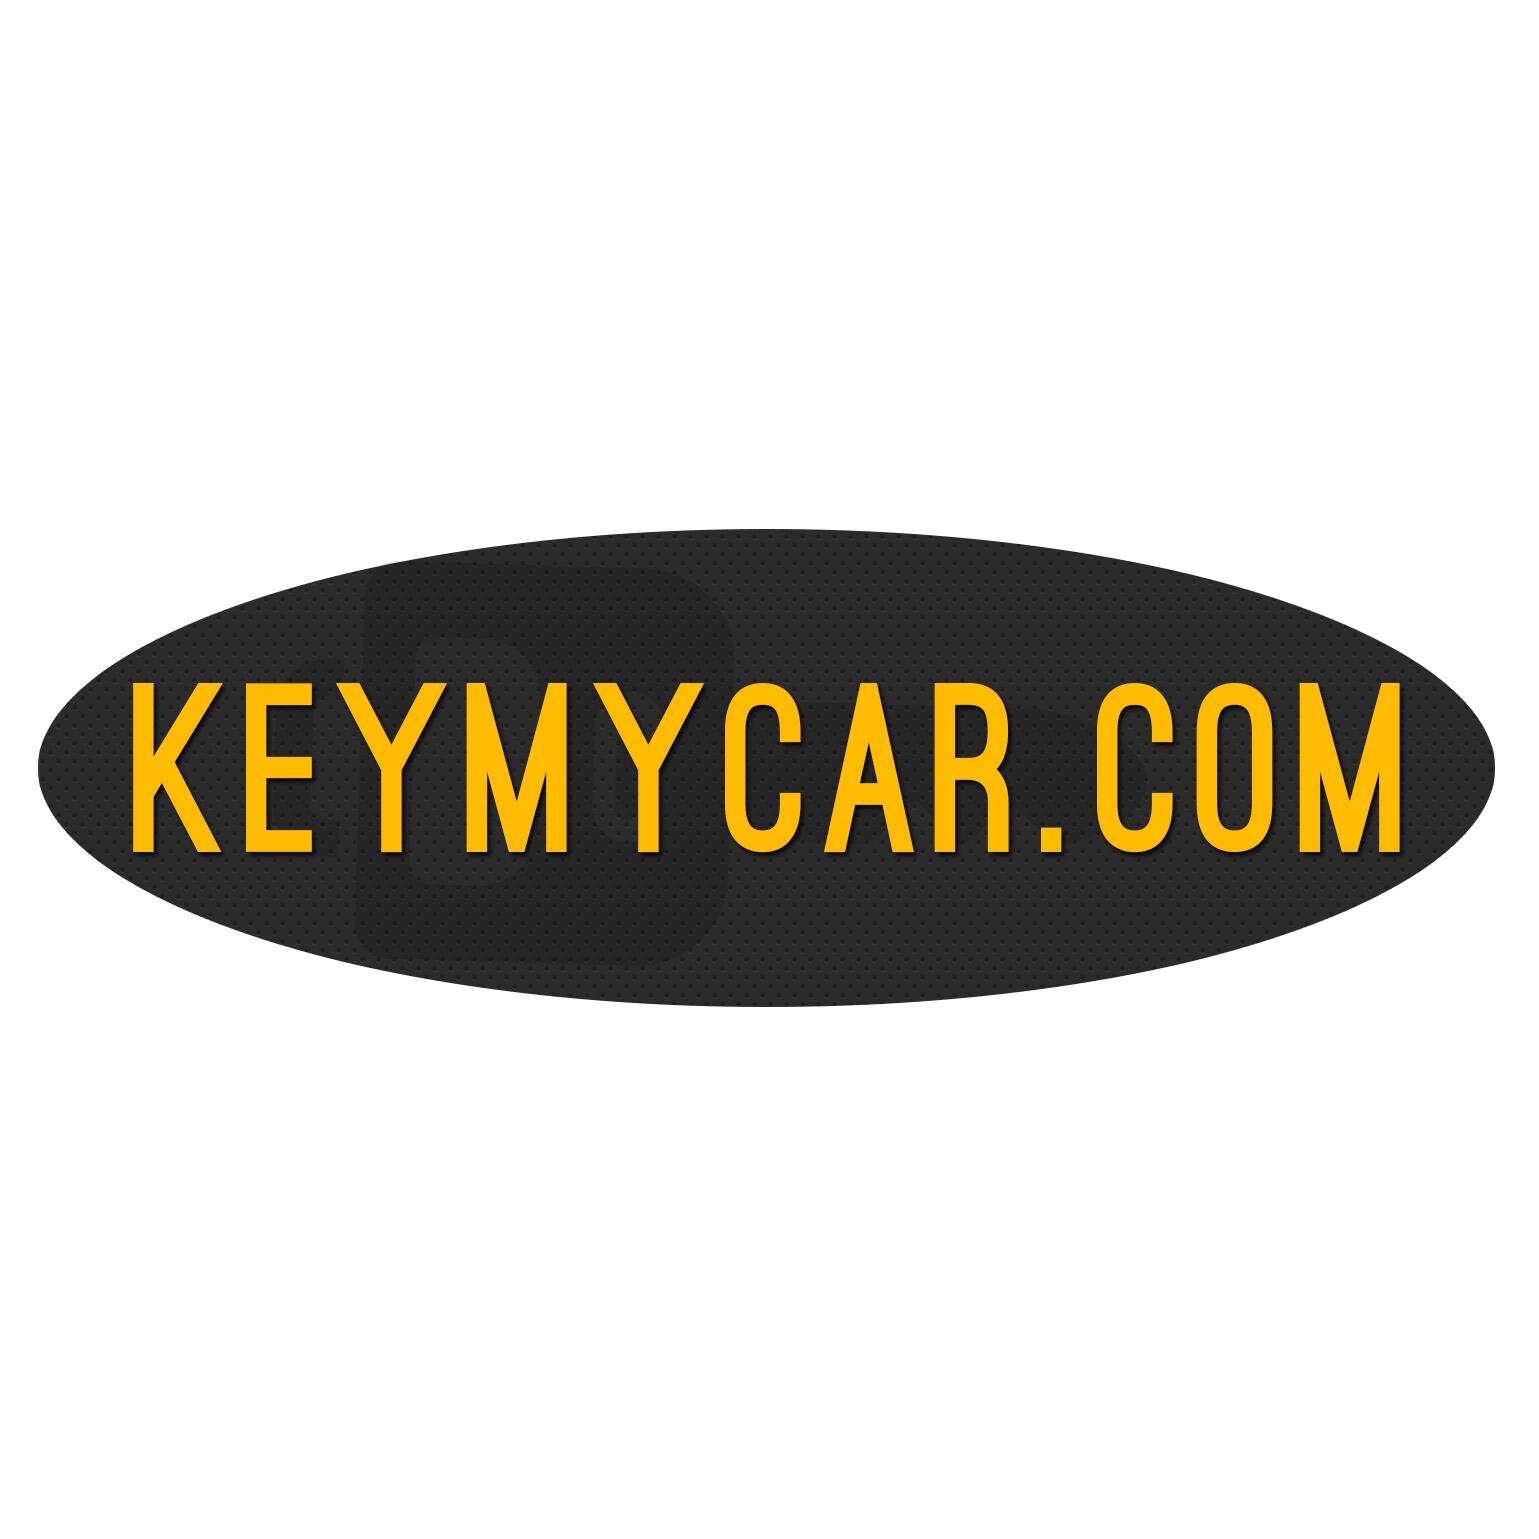 KeyMyCarCOM